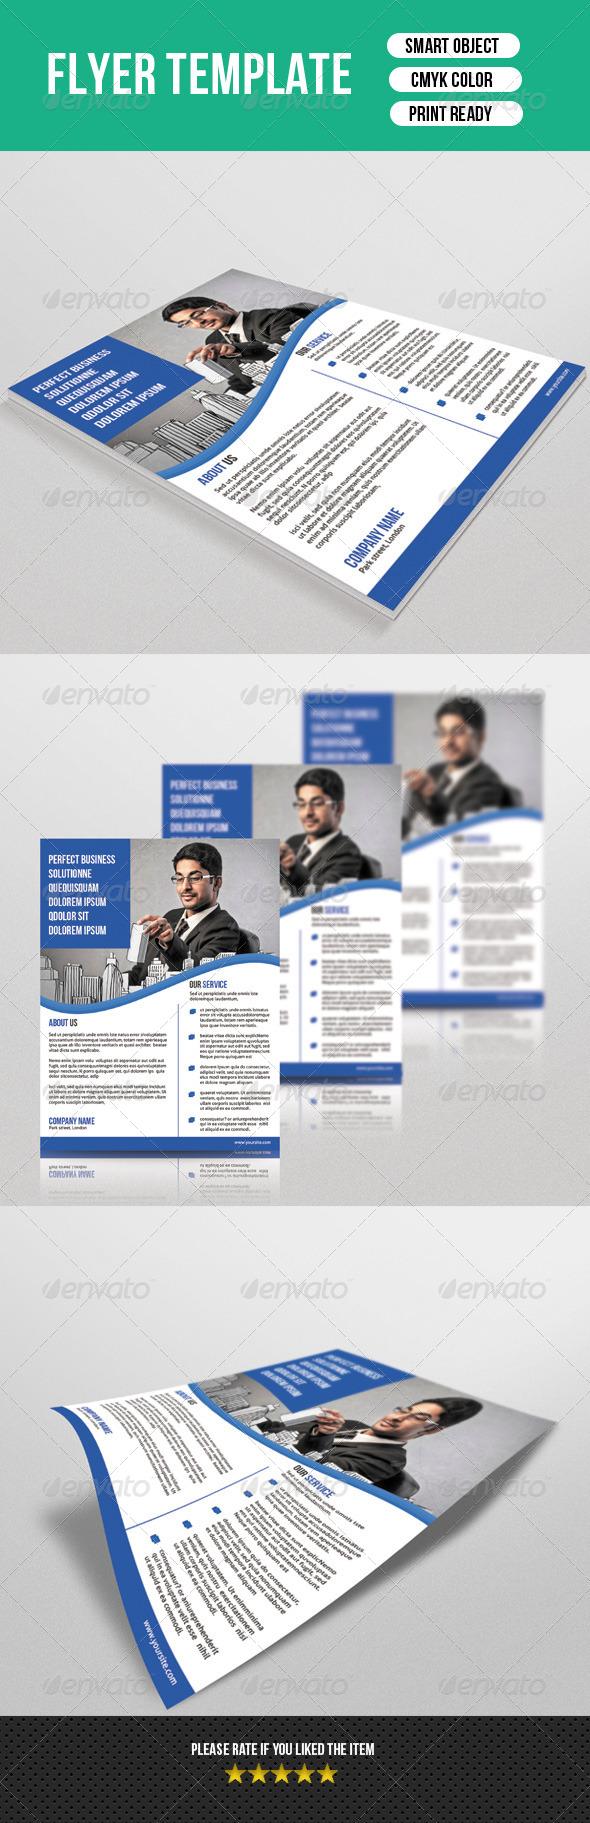 GraphicRiver Corporate Flyer Template 7396837